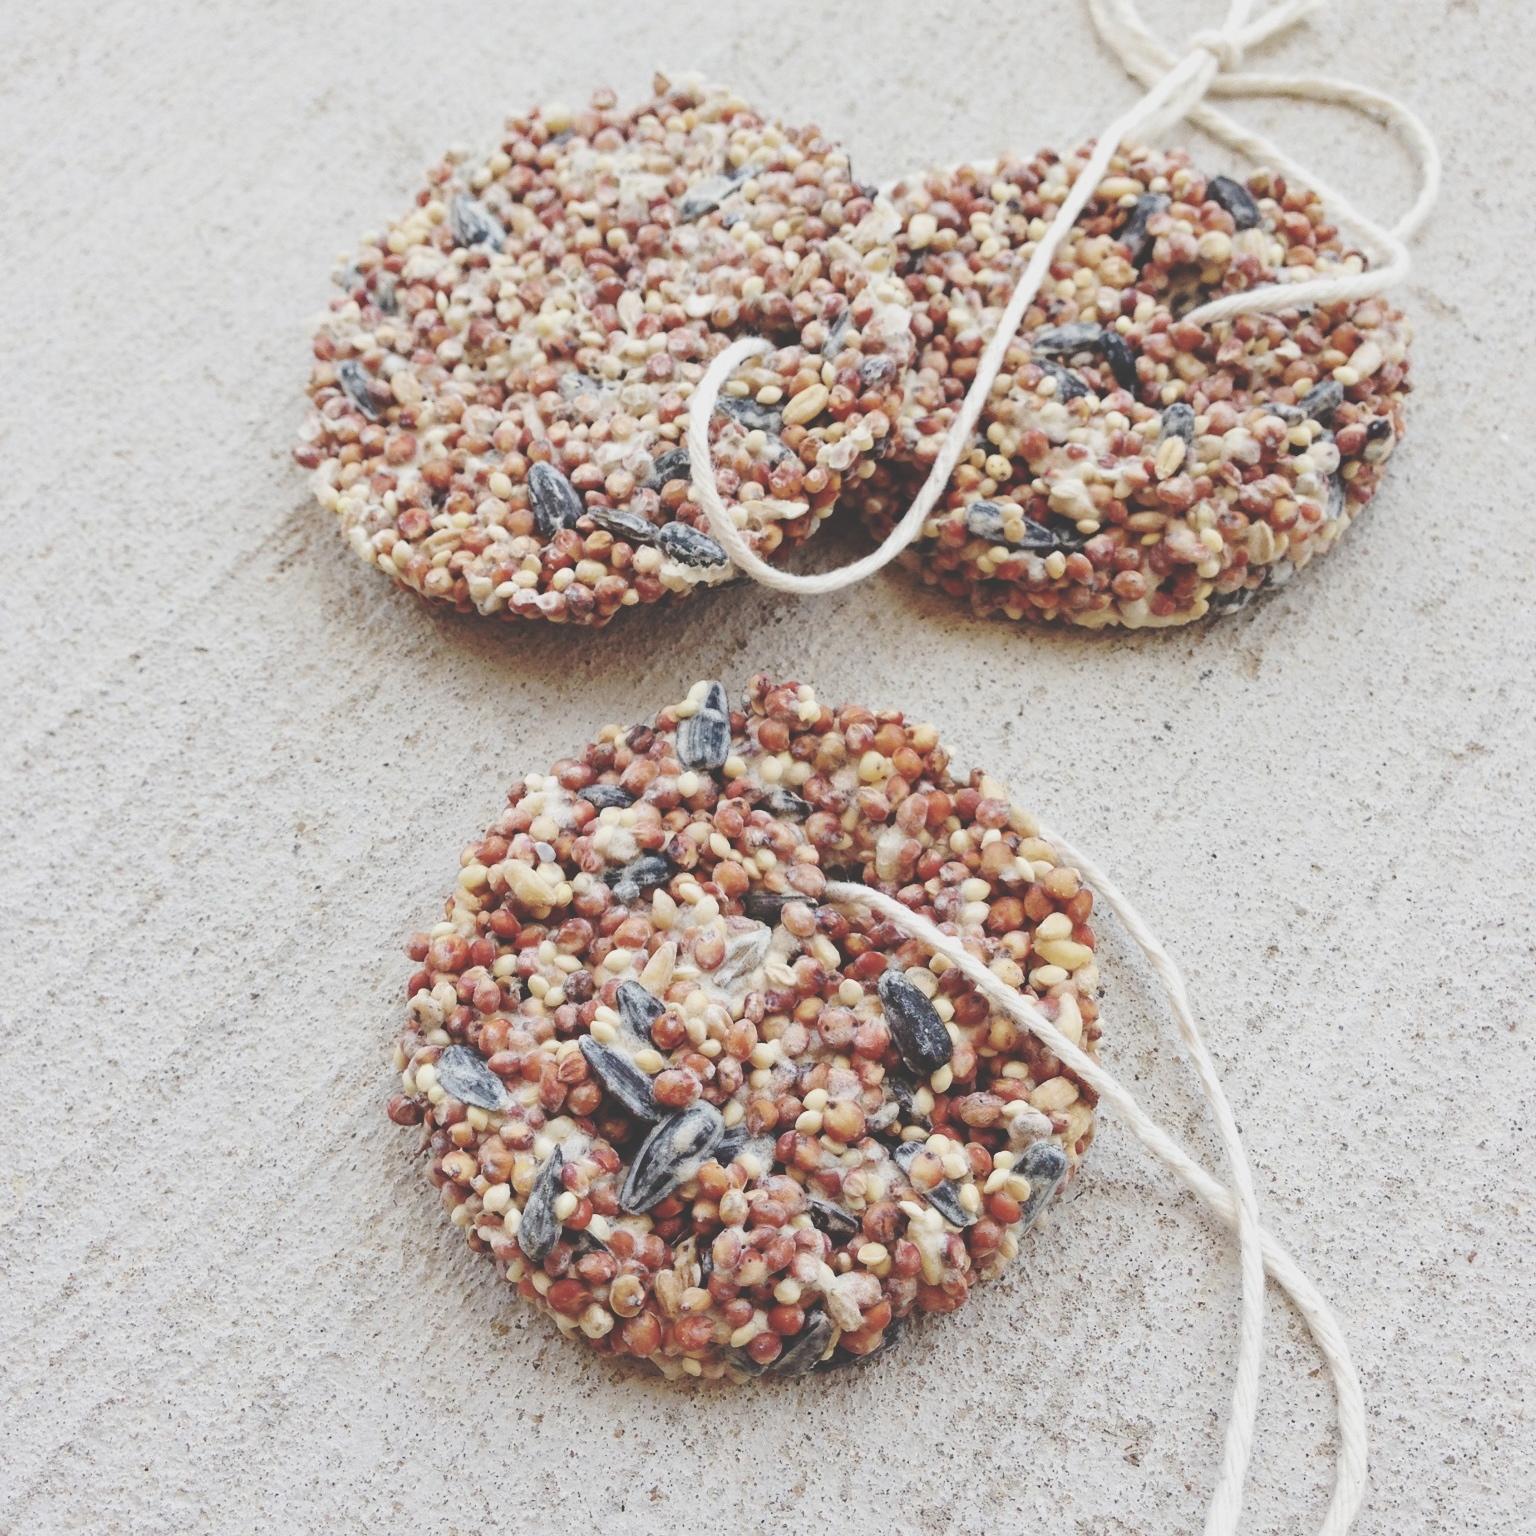 Birdseed bird feeder ornaments for How to make suet balls for bird feeders